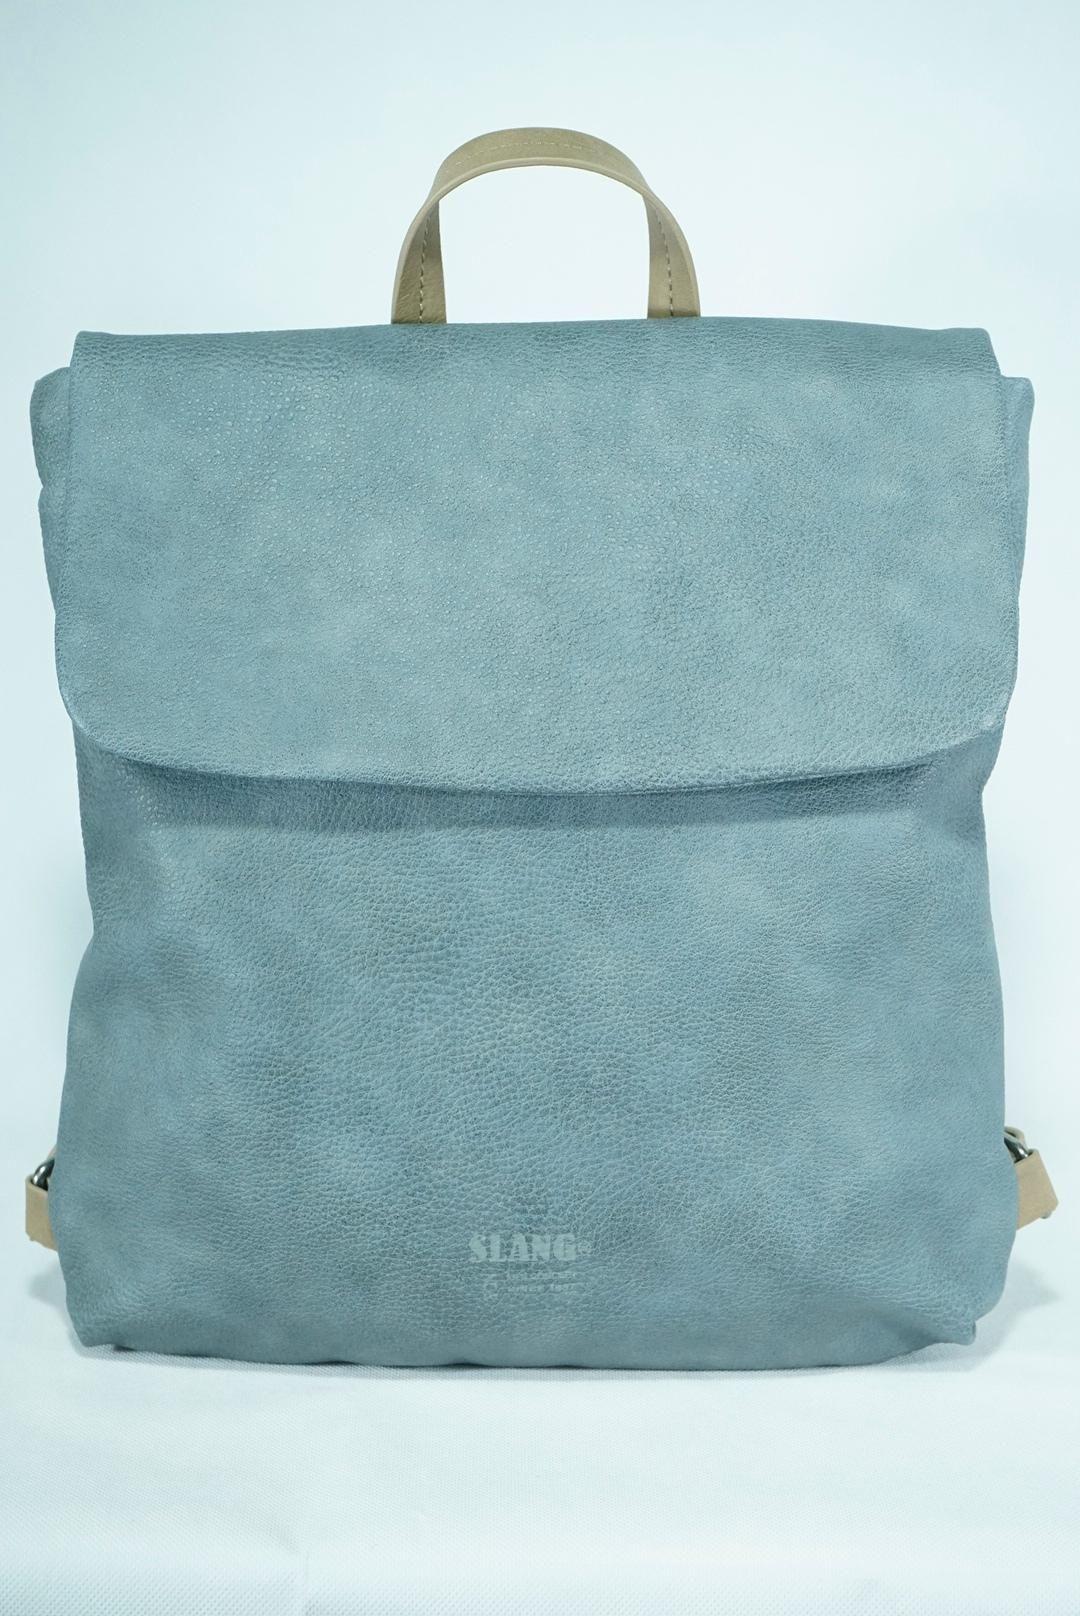 c9f9120d0 Comprar Bolso Mochila Slang TEST Azul Celeste TE3 35 online | Slang ...